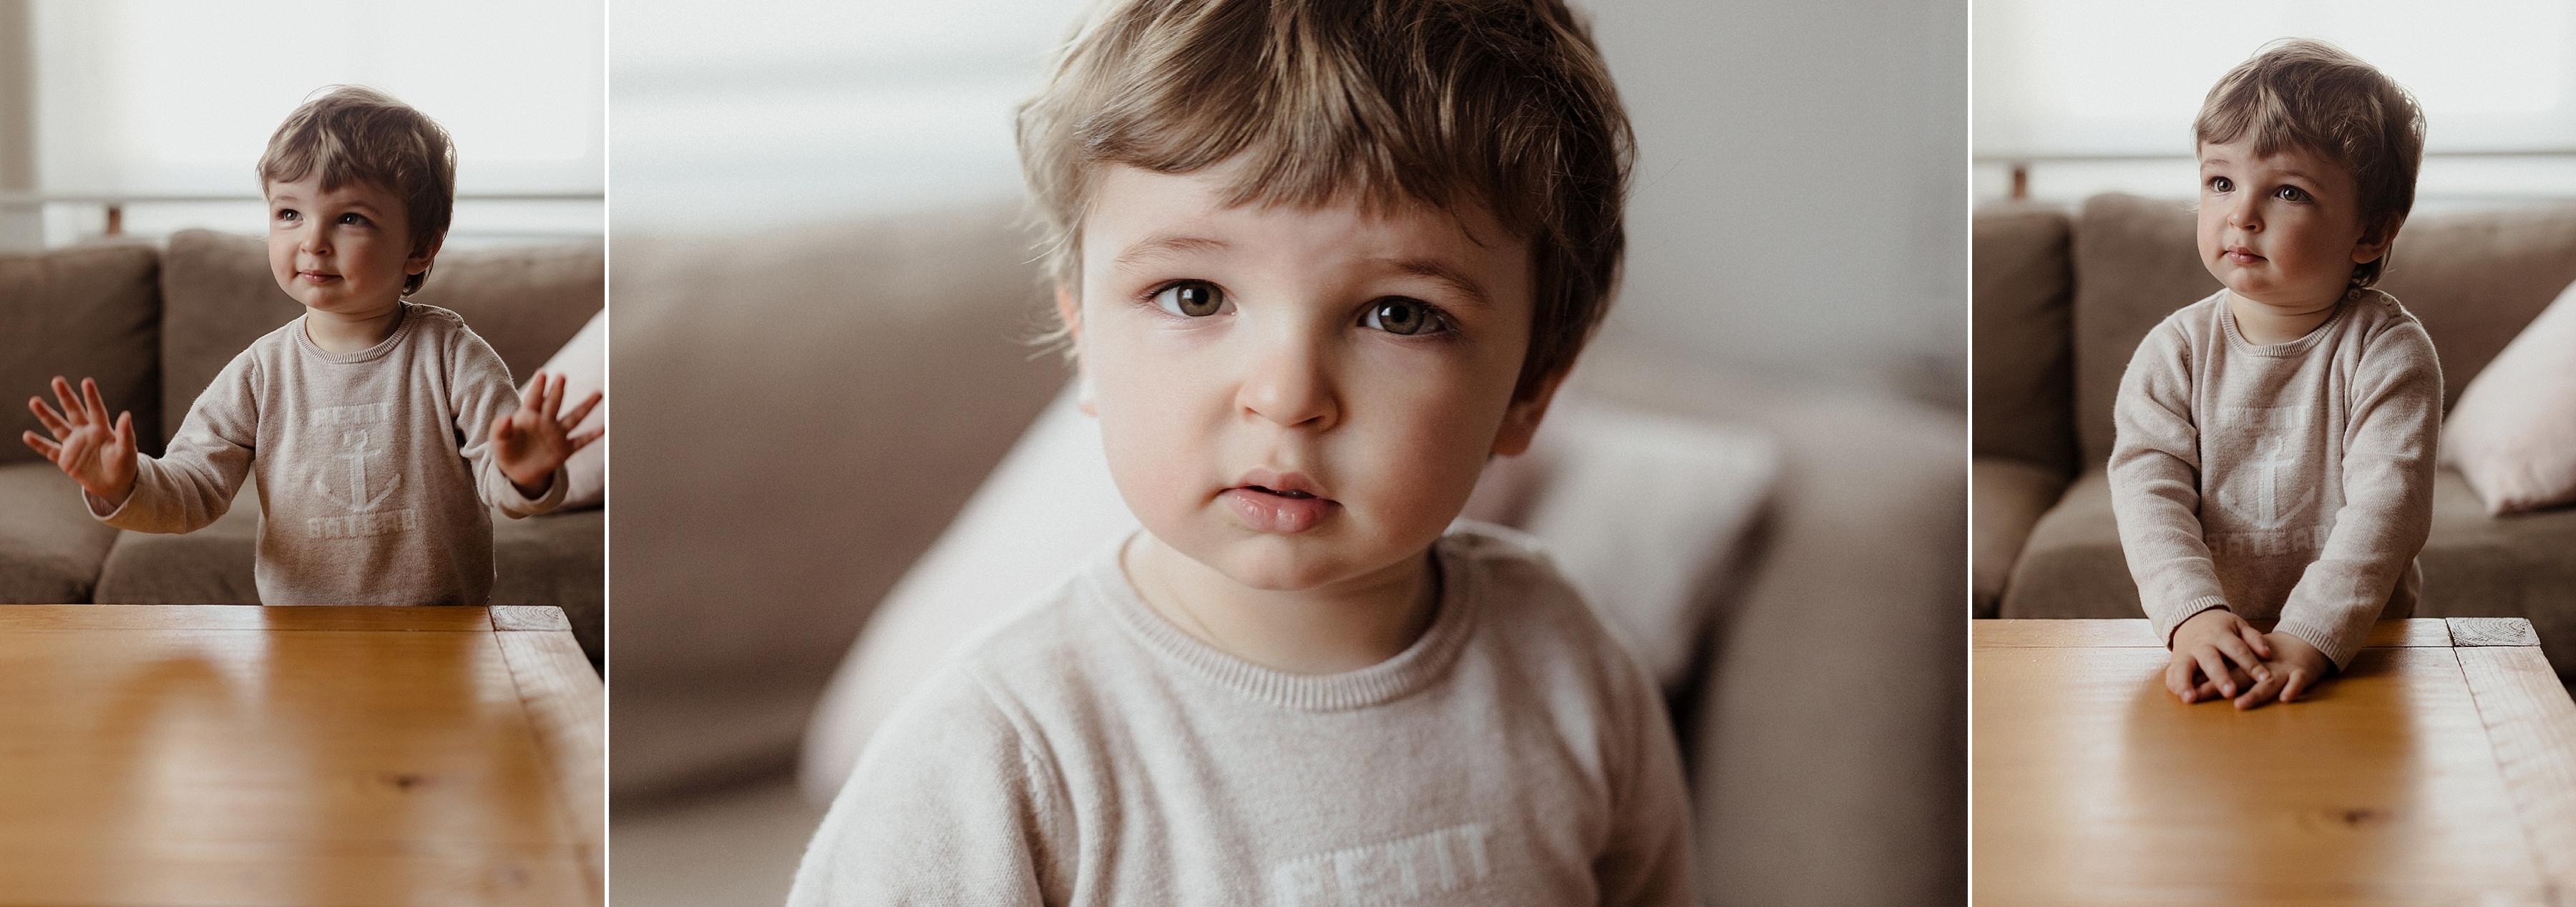 photographe enfant, portraits petit garçon